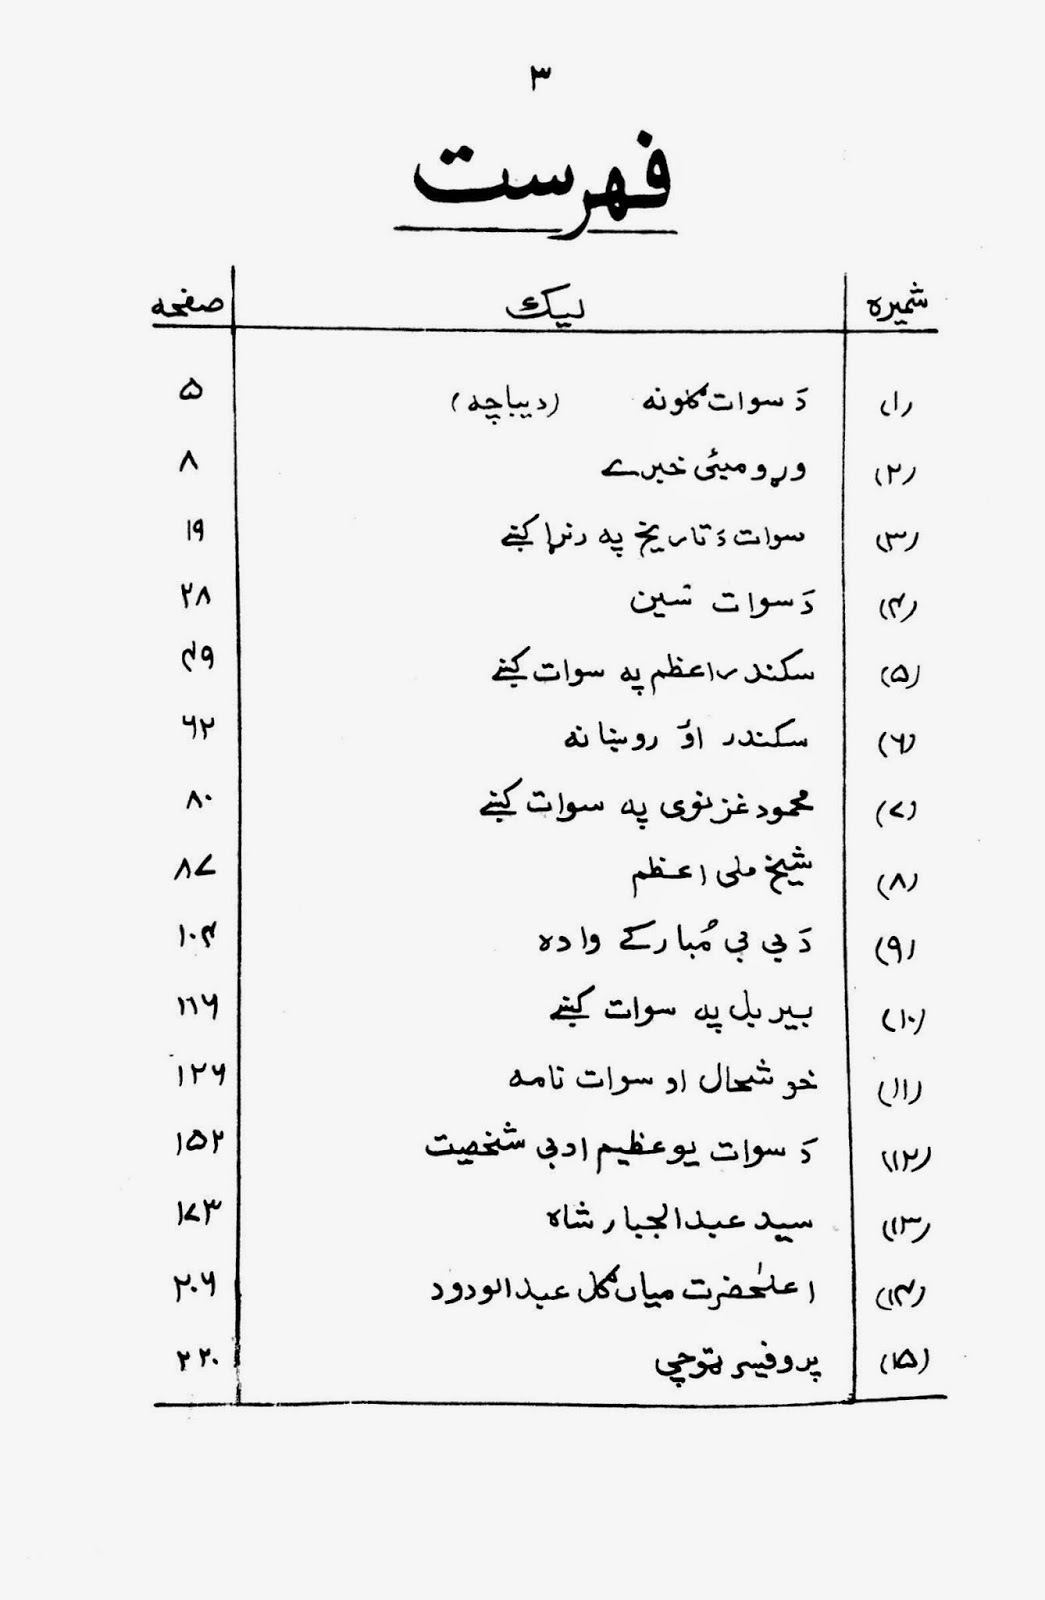 Contents: Da Swat Guloona By Parvesh Shaheen